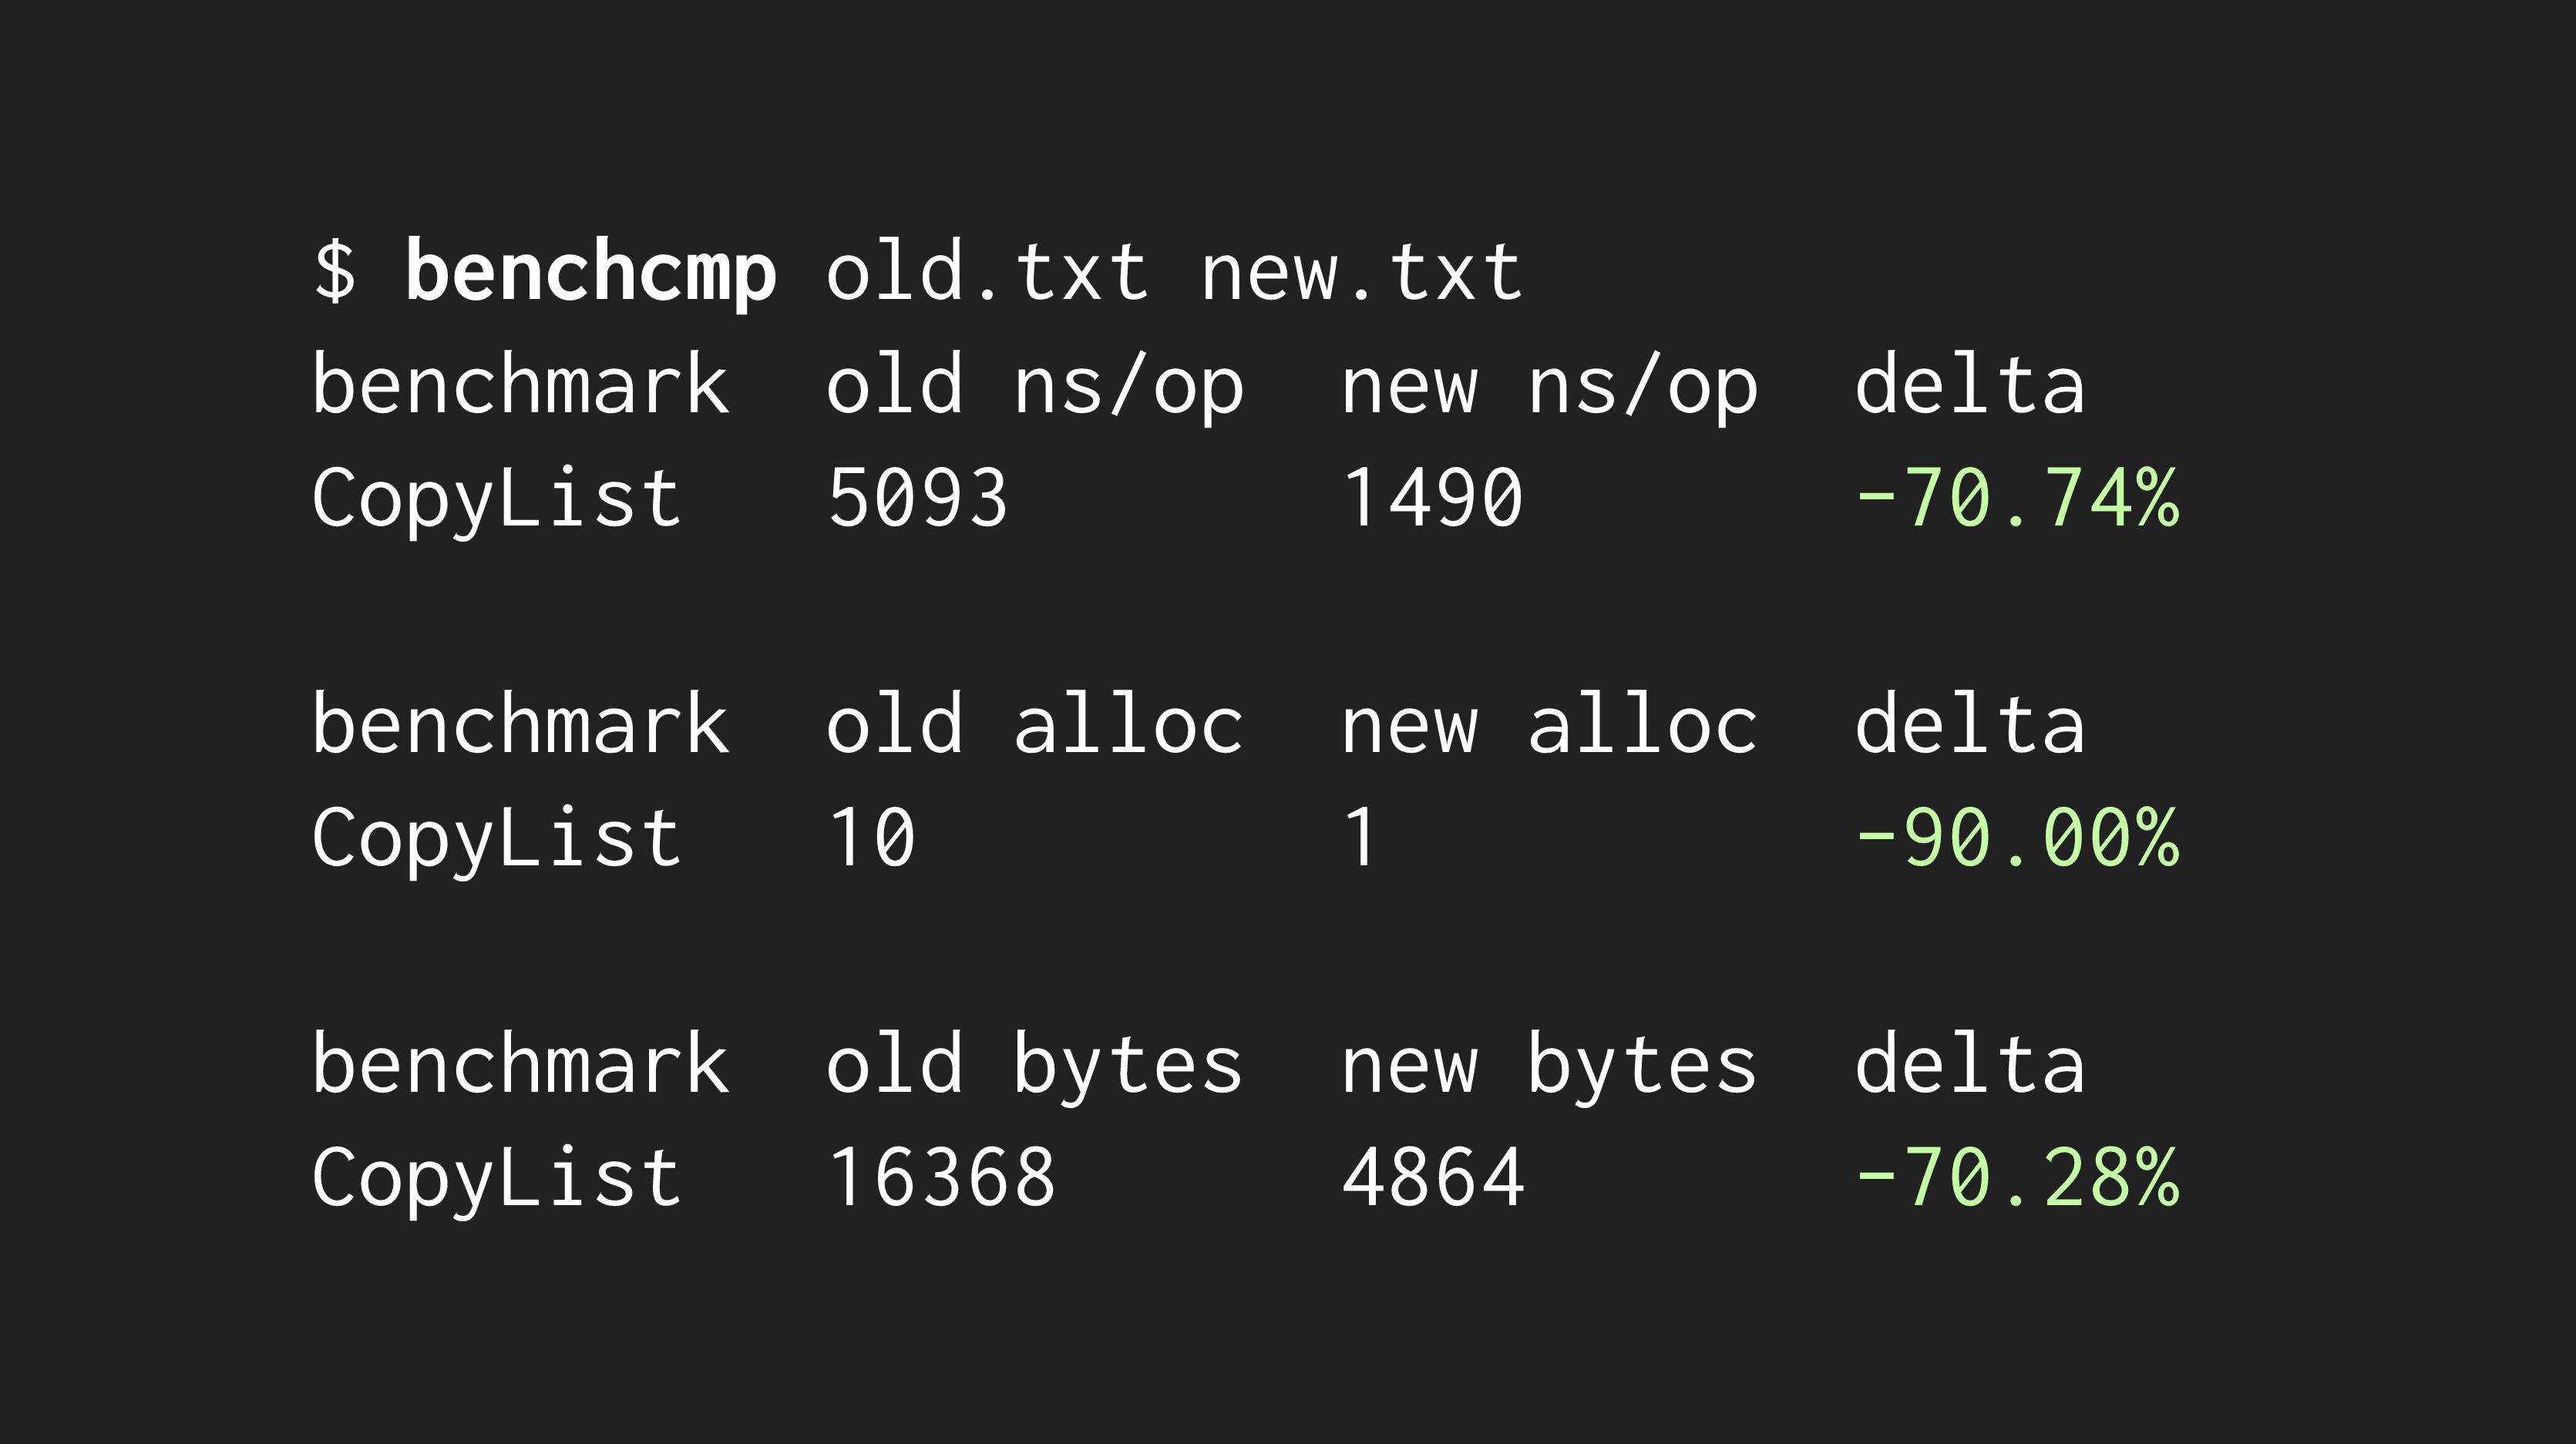 benchcmp output